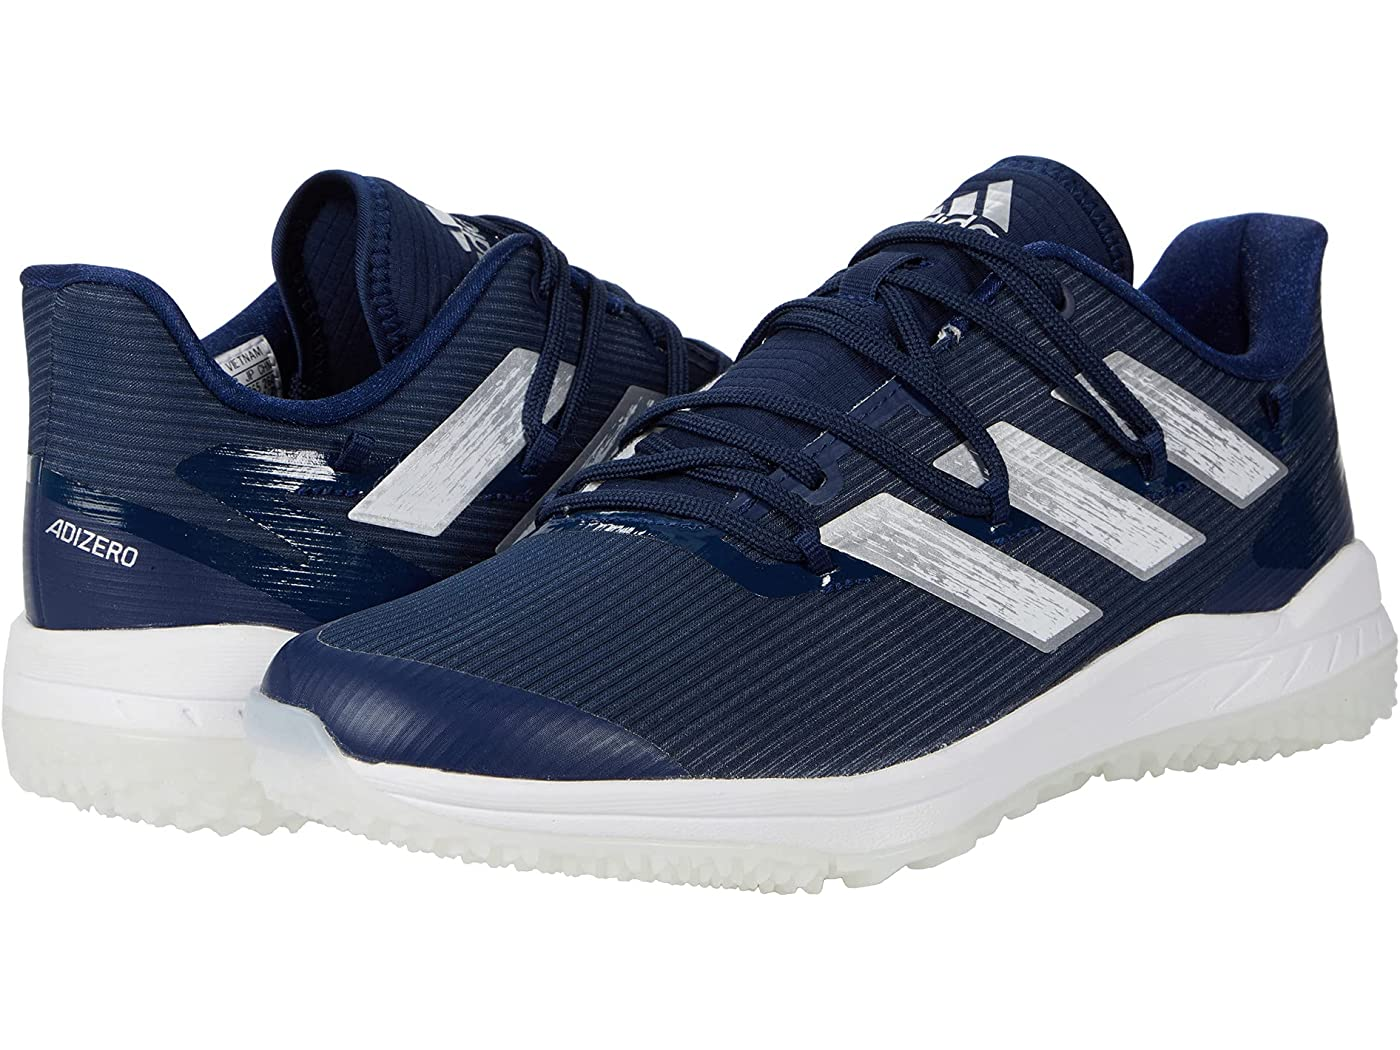 Adidas Adizero Afterburner 8 Turf